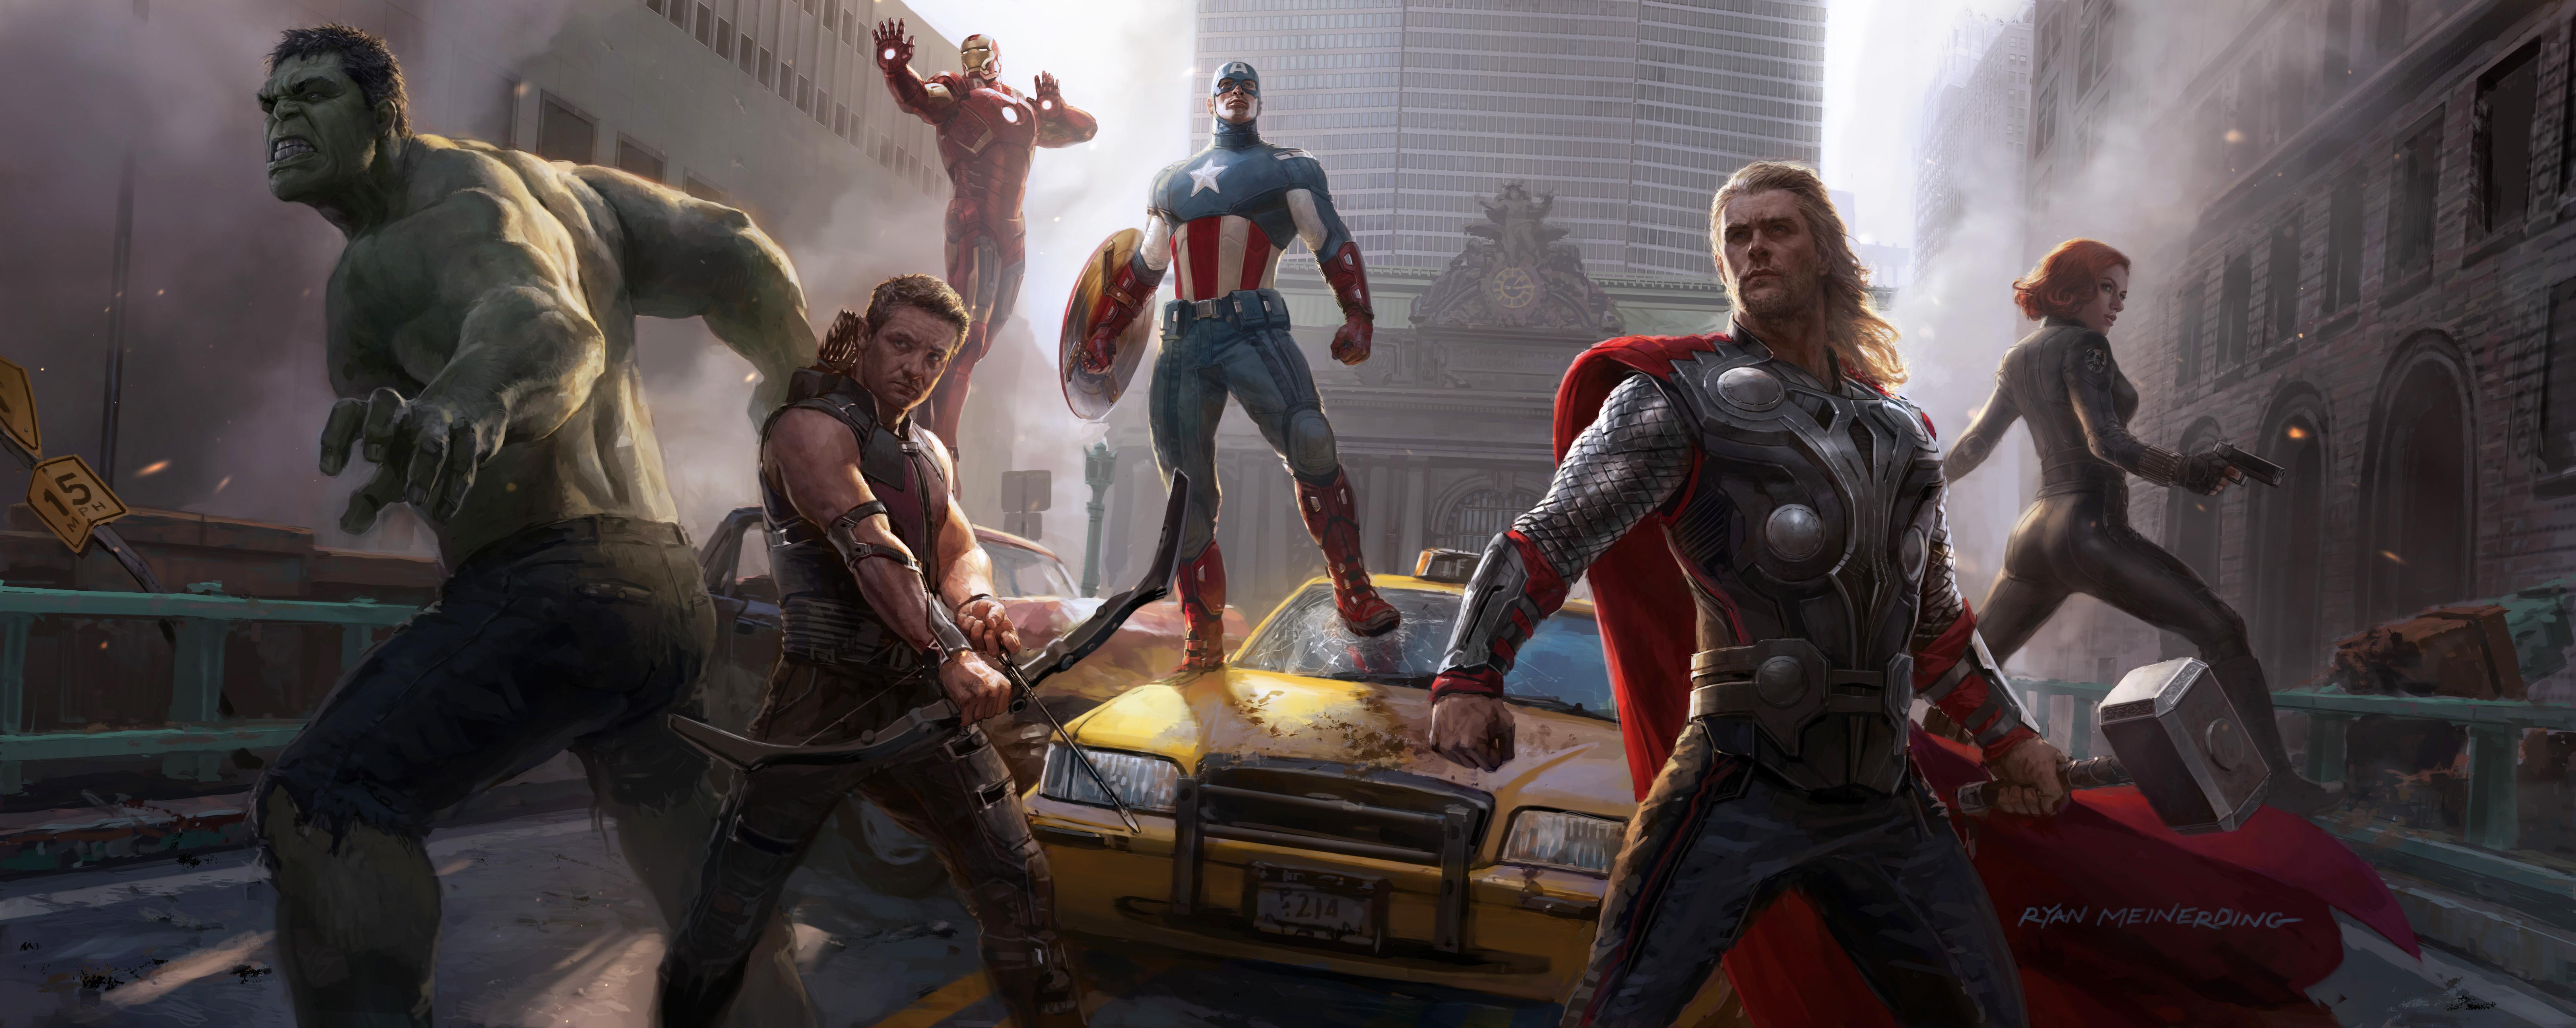 Download marvel heroes 1440x2560 resolution hd 8k wallpaper download original voltagebd Image collections